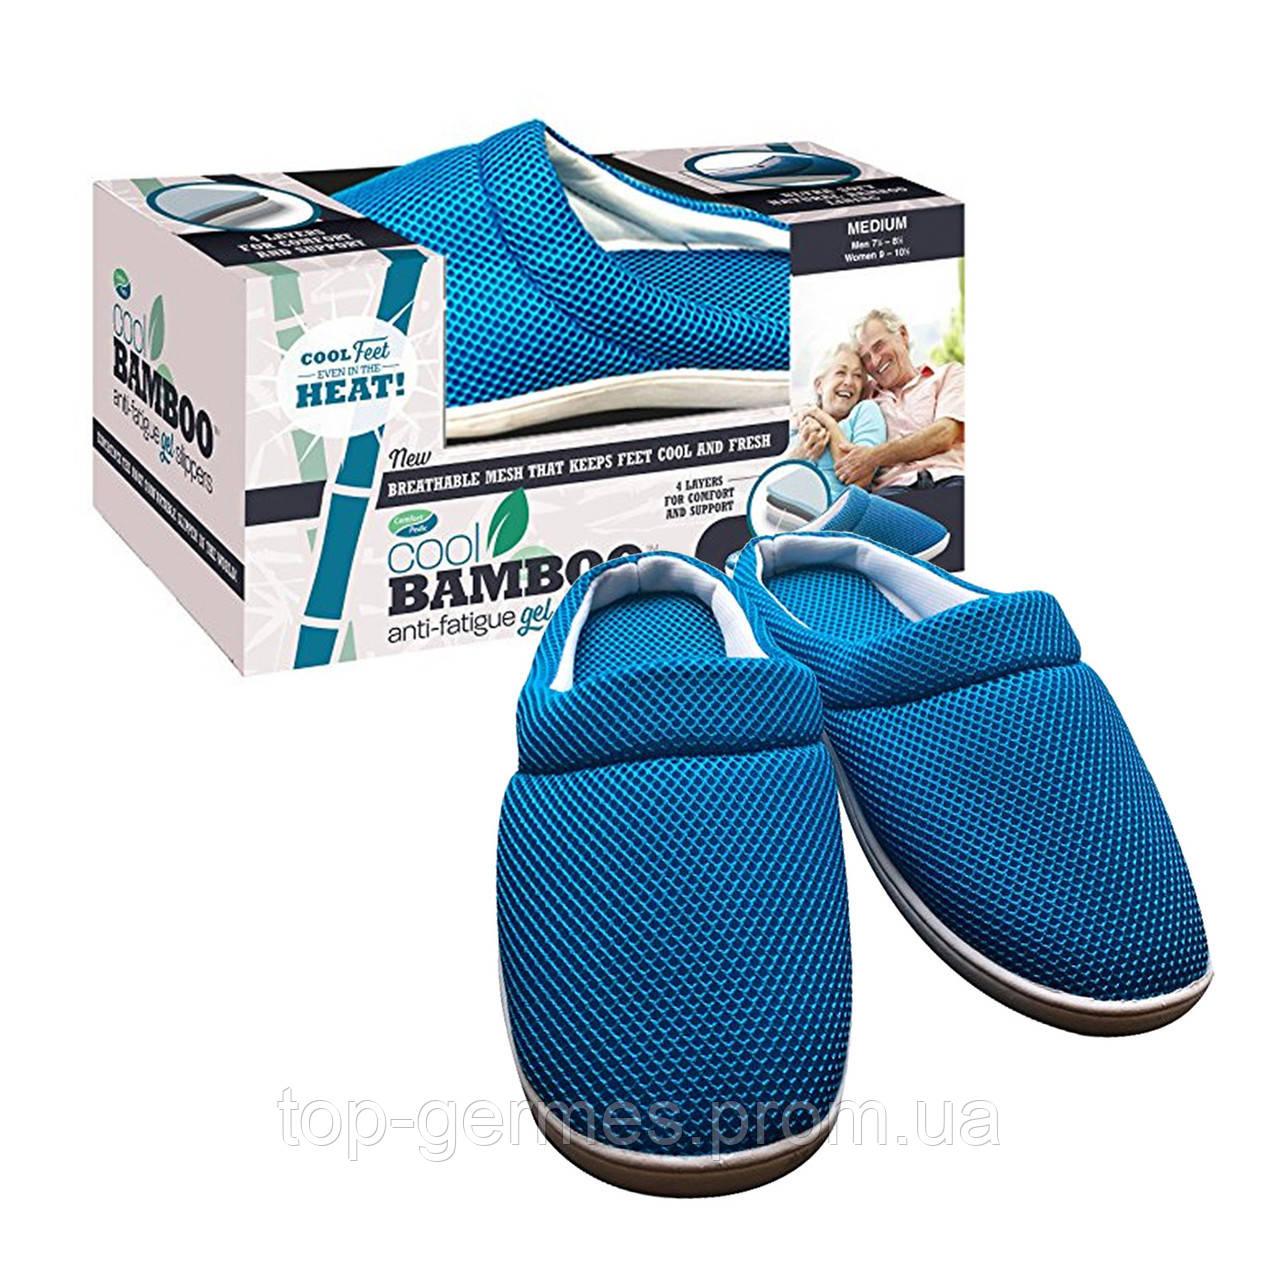 Легкие домашние тапки cool bamboo anti-fatigue gel slippers